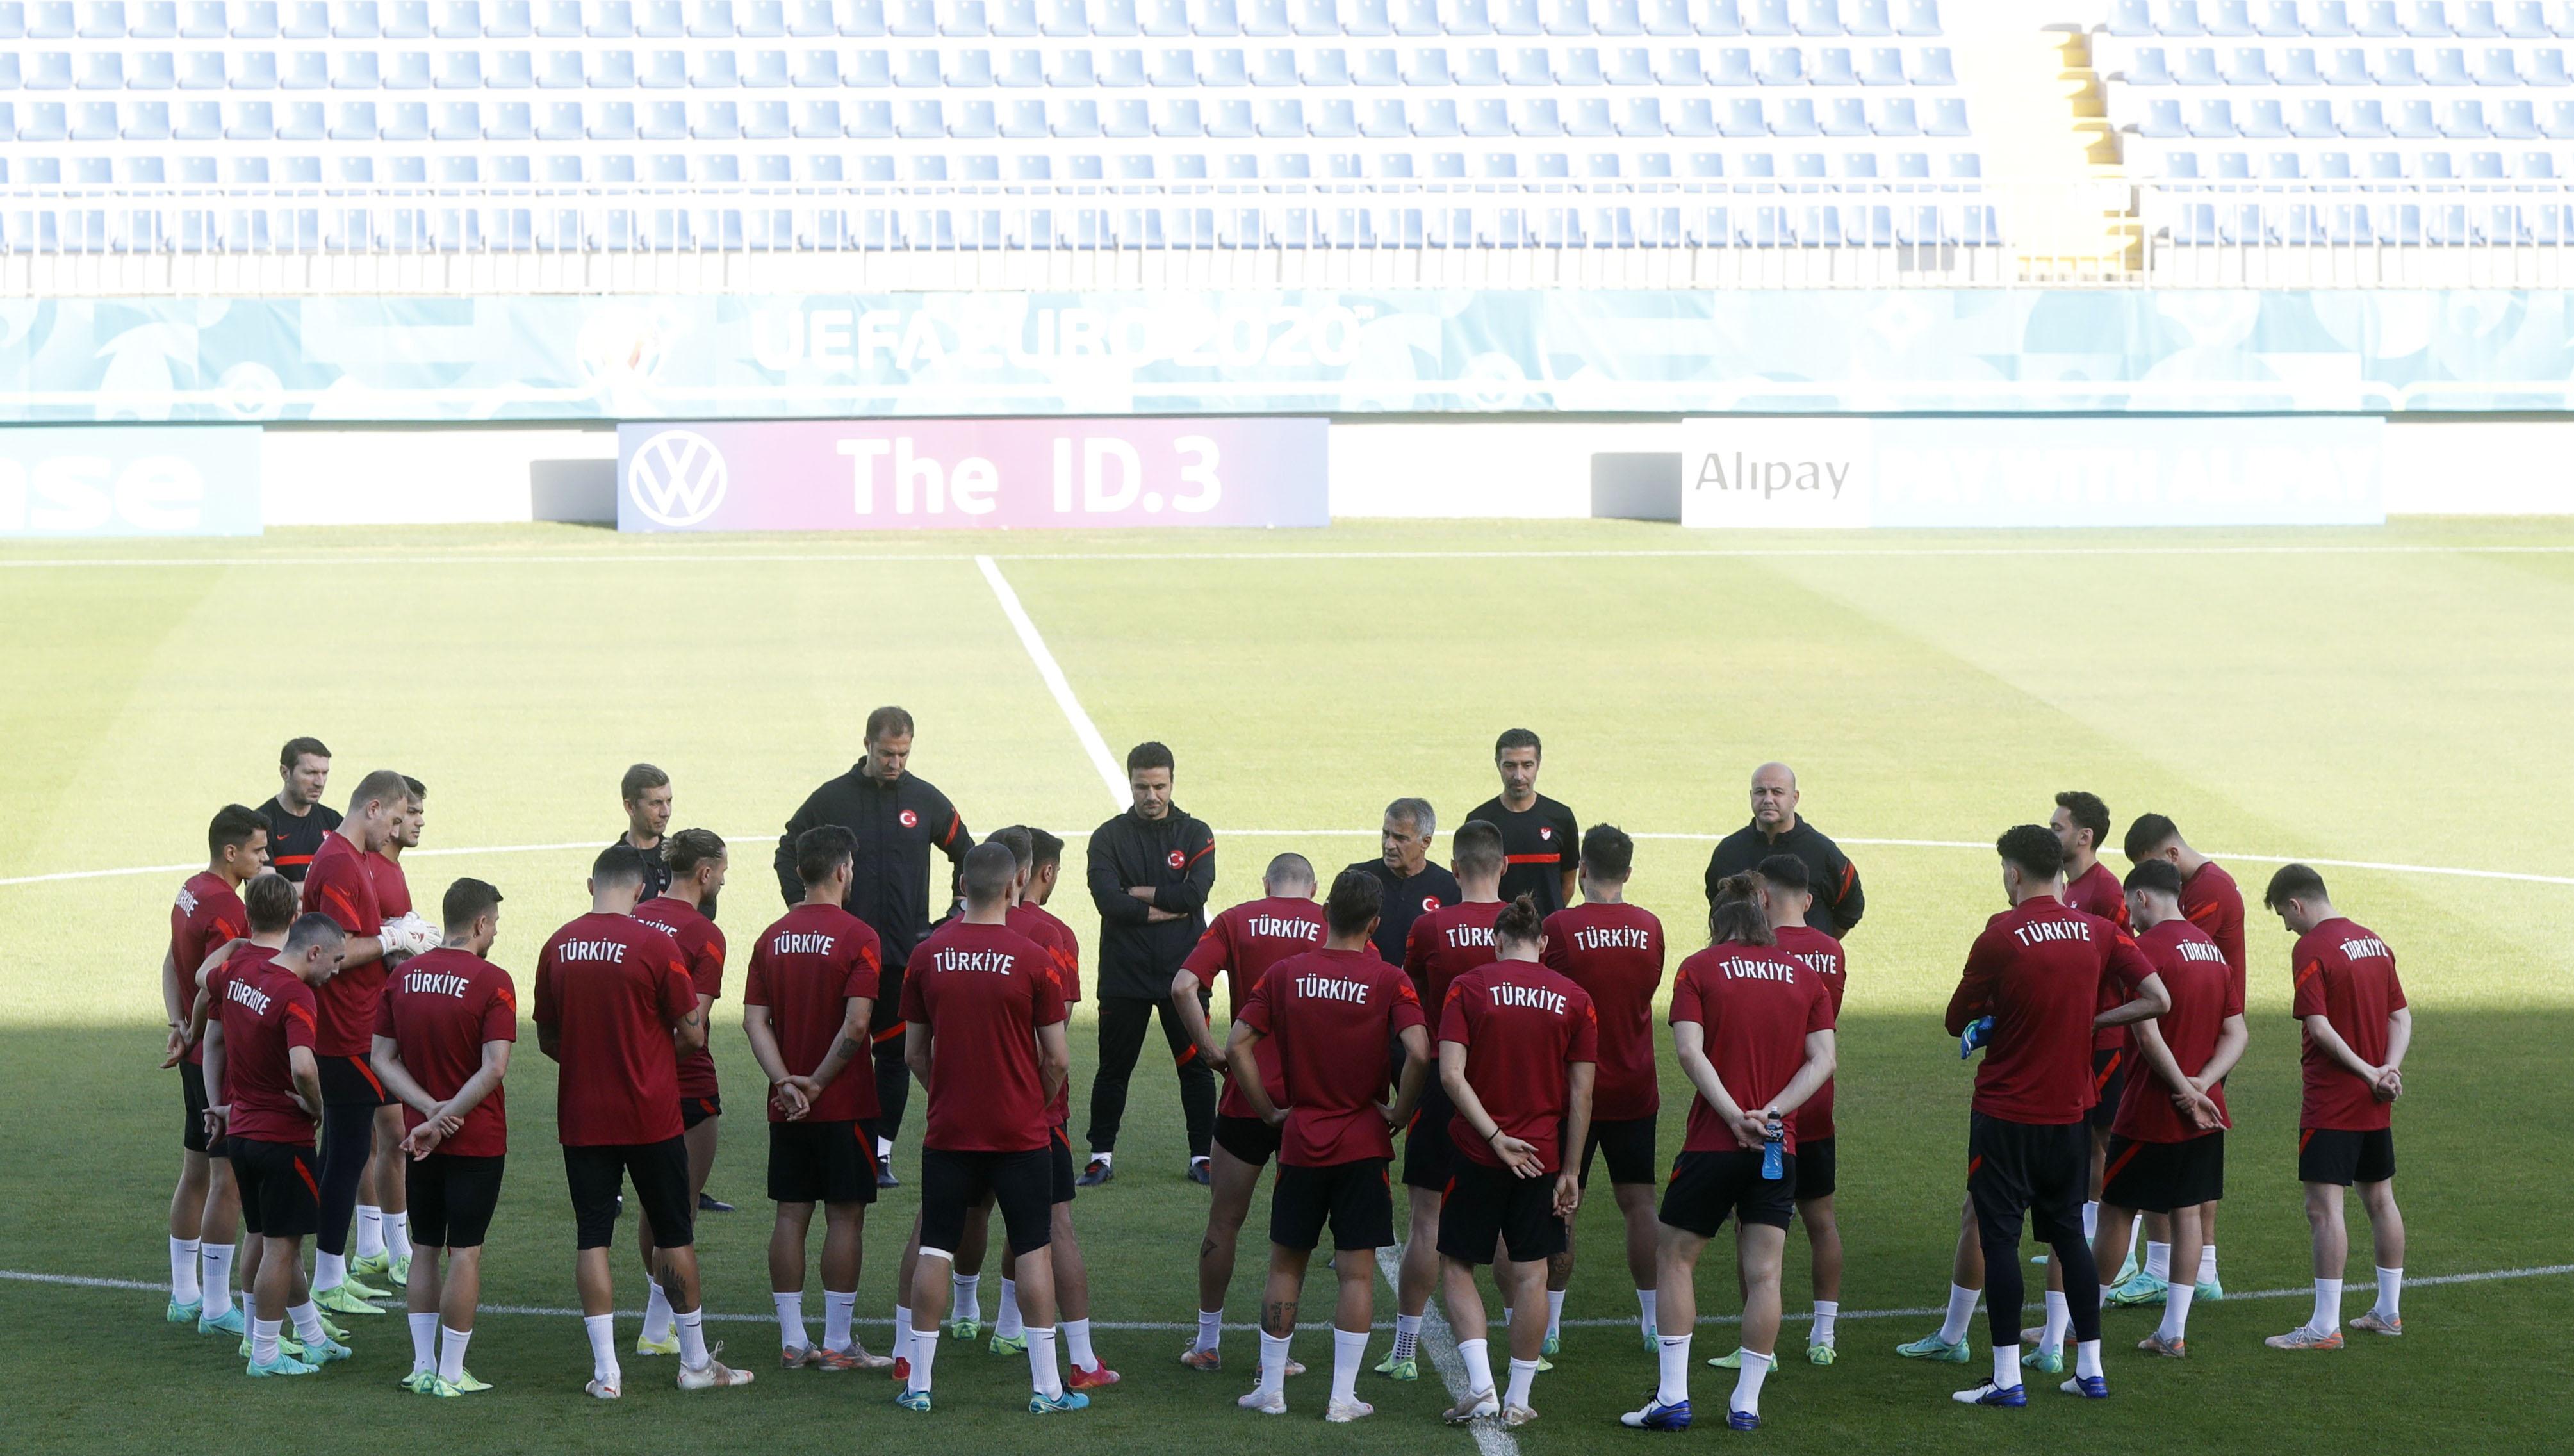 Soccer Football - Euro 2020 - Turkey Training - 8km Stadium, Baku, Azerbaijan - June 19, 2021 General view of Turkey players during training REUTERS/Valentyn Ogirenko